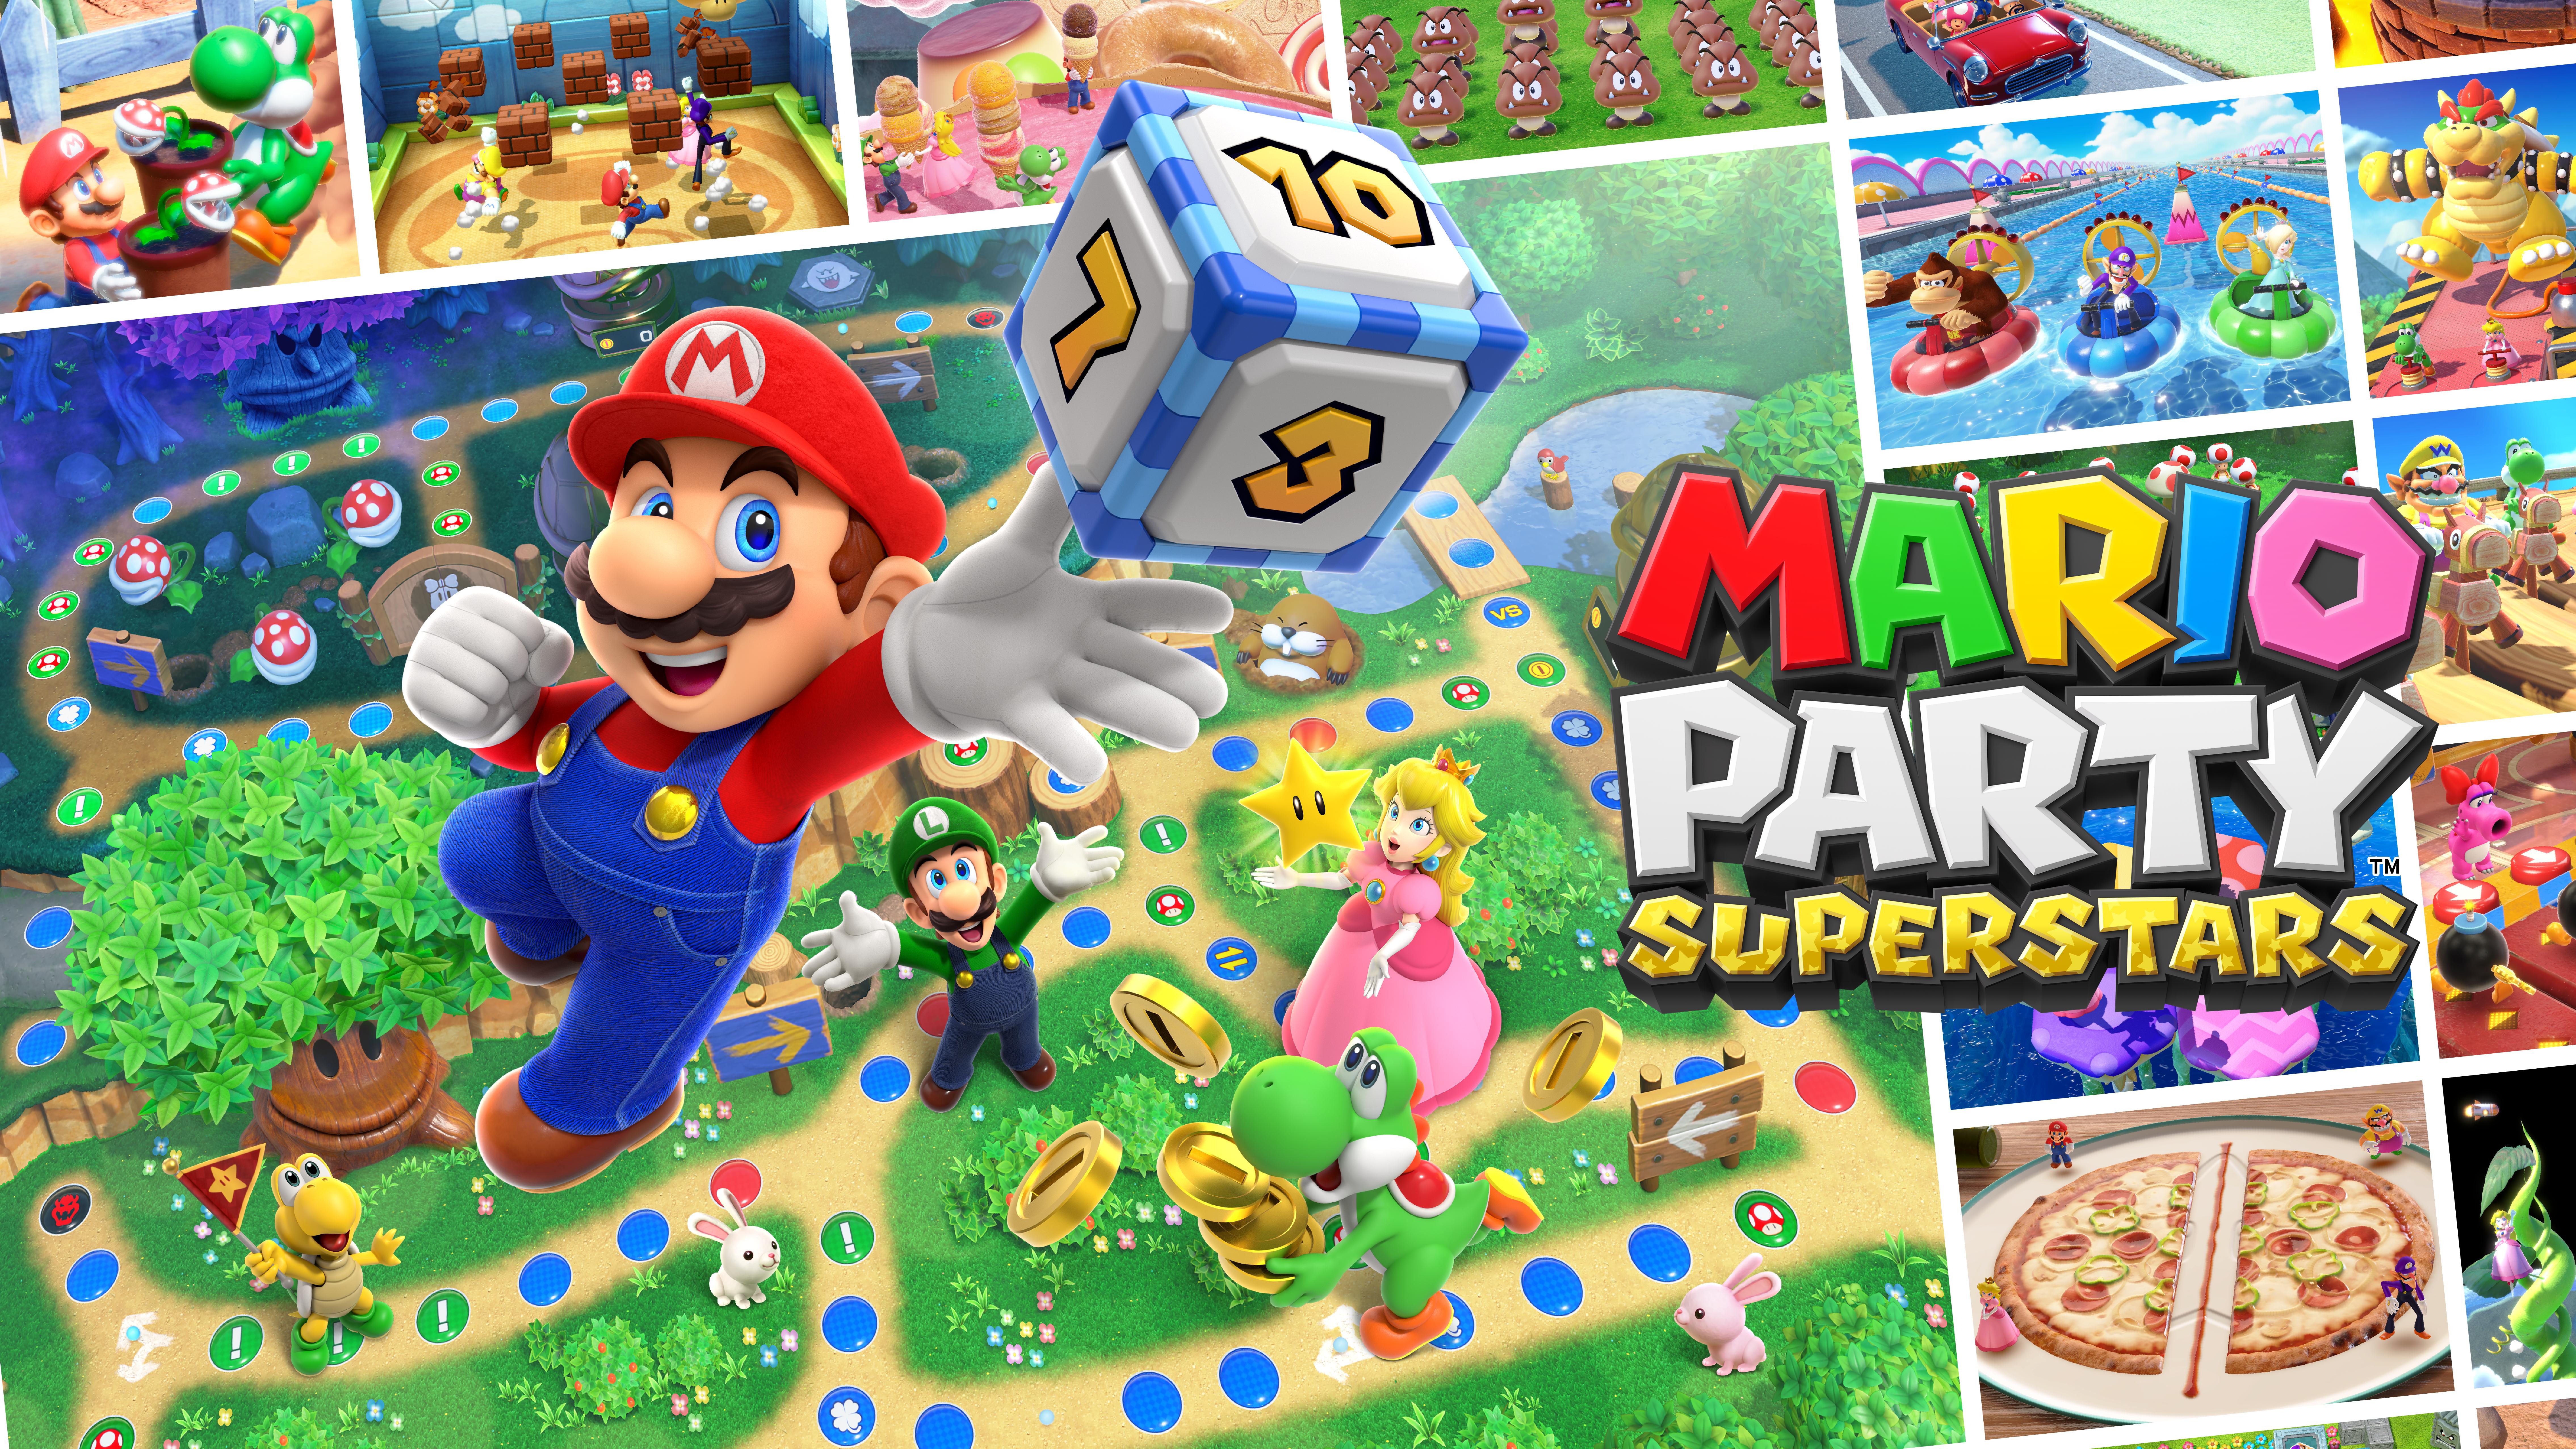 Switch MarioPartySuperstars artwork 03 Mario Party Superstars